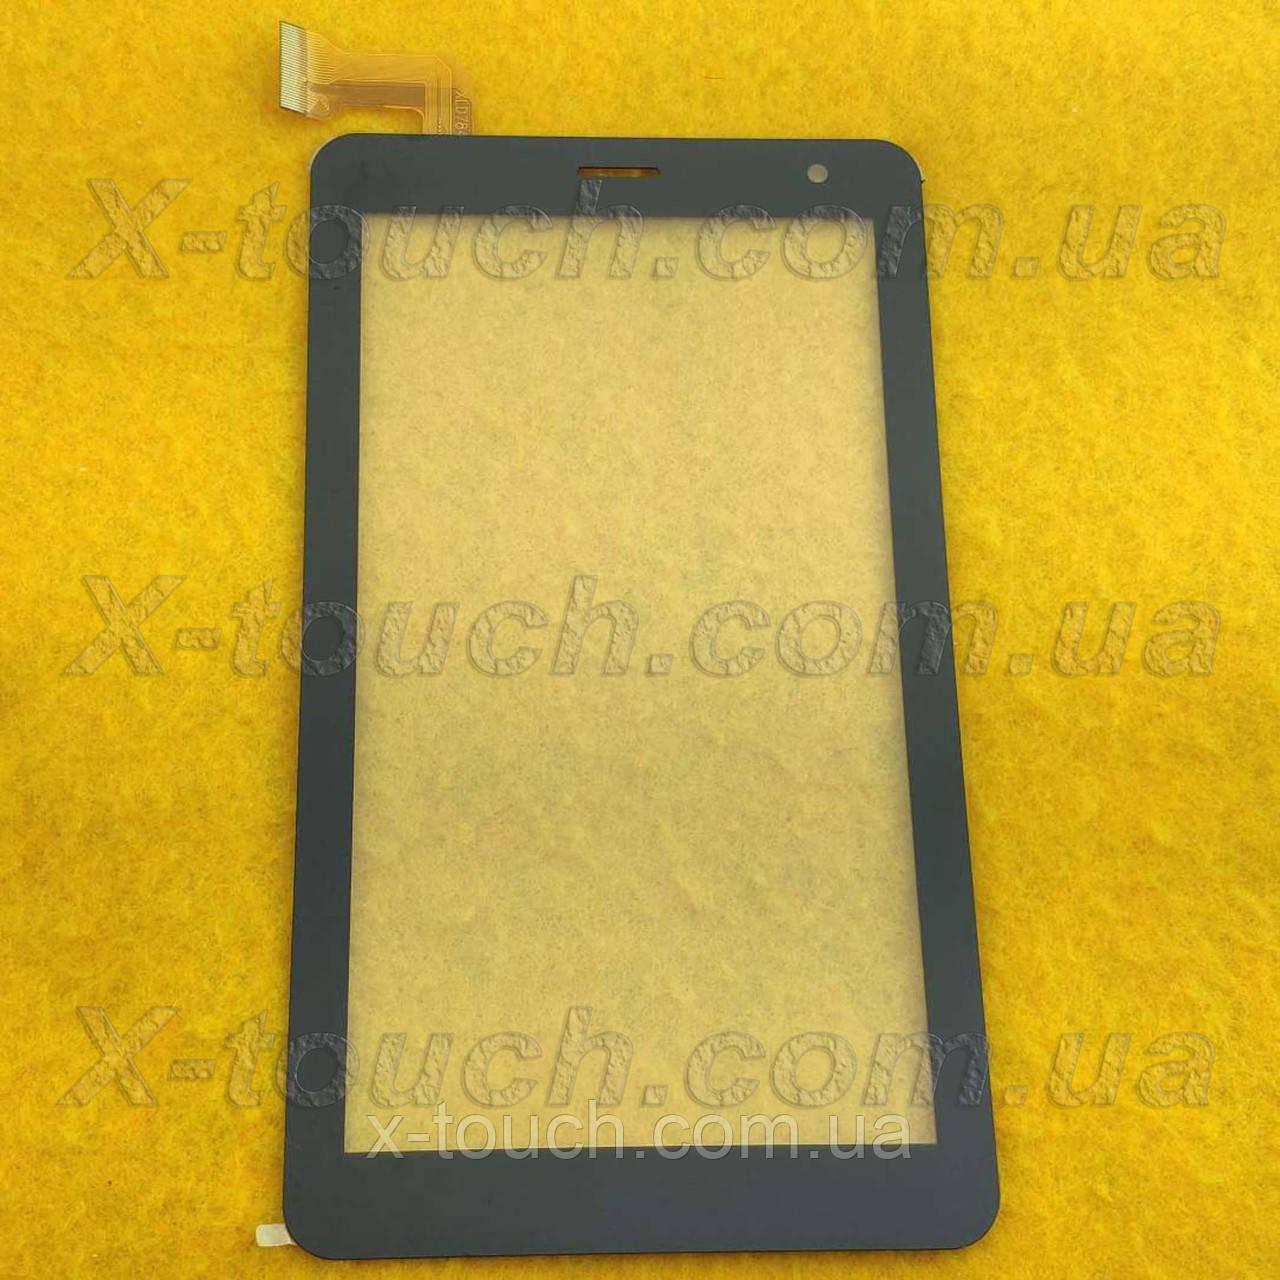 Cенсор, тачскрин CX19A-046-V02 для планшета